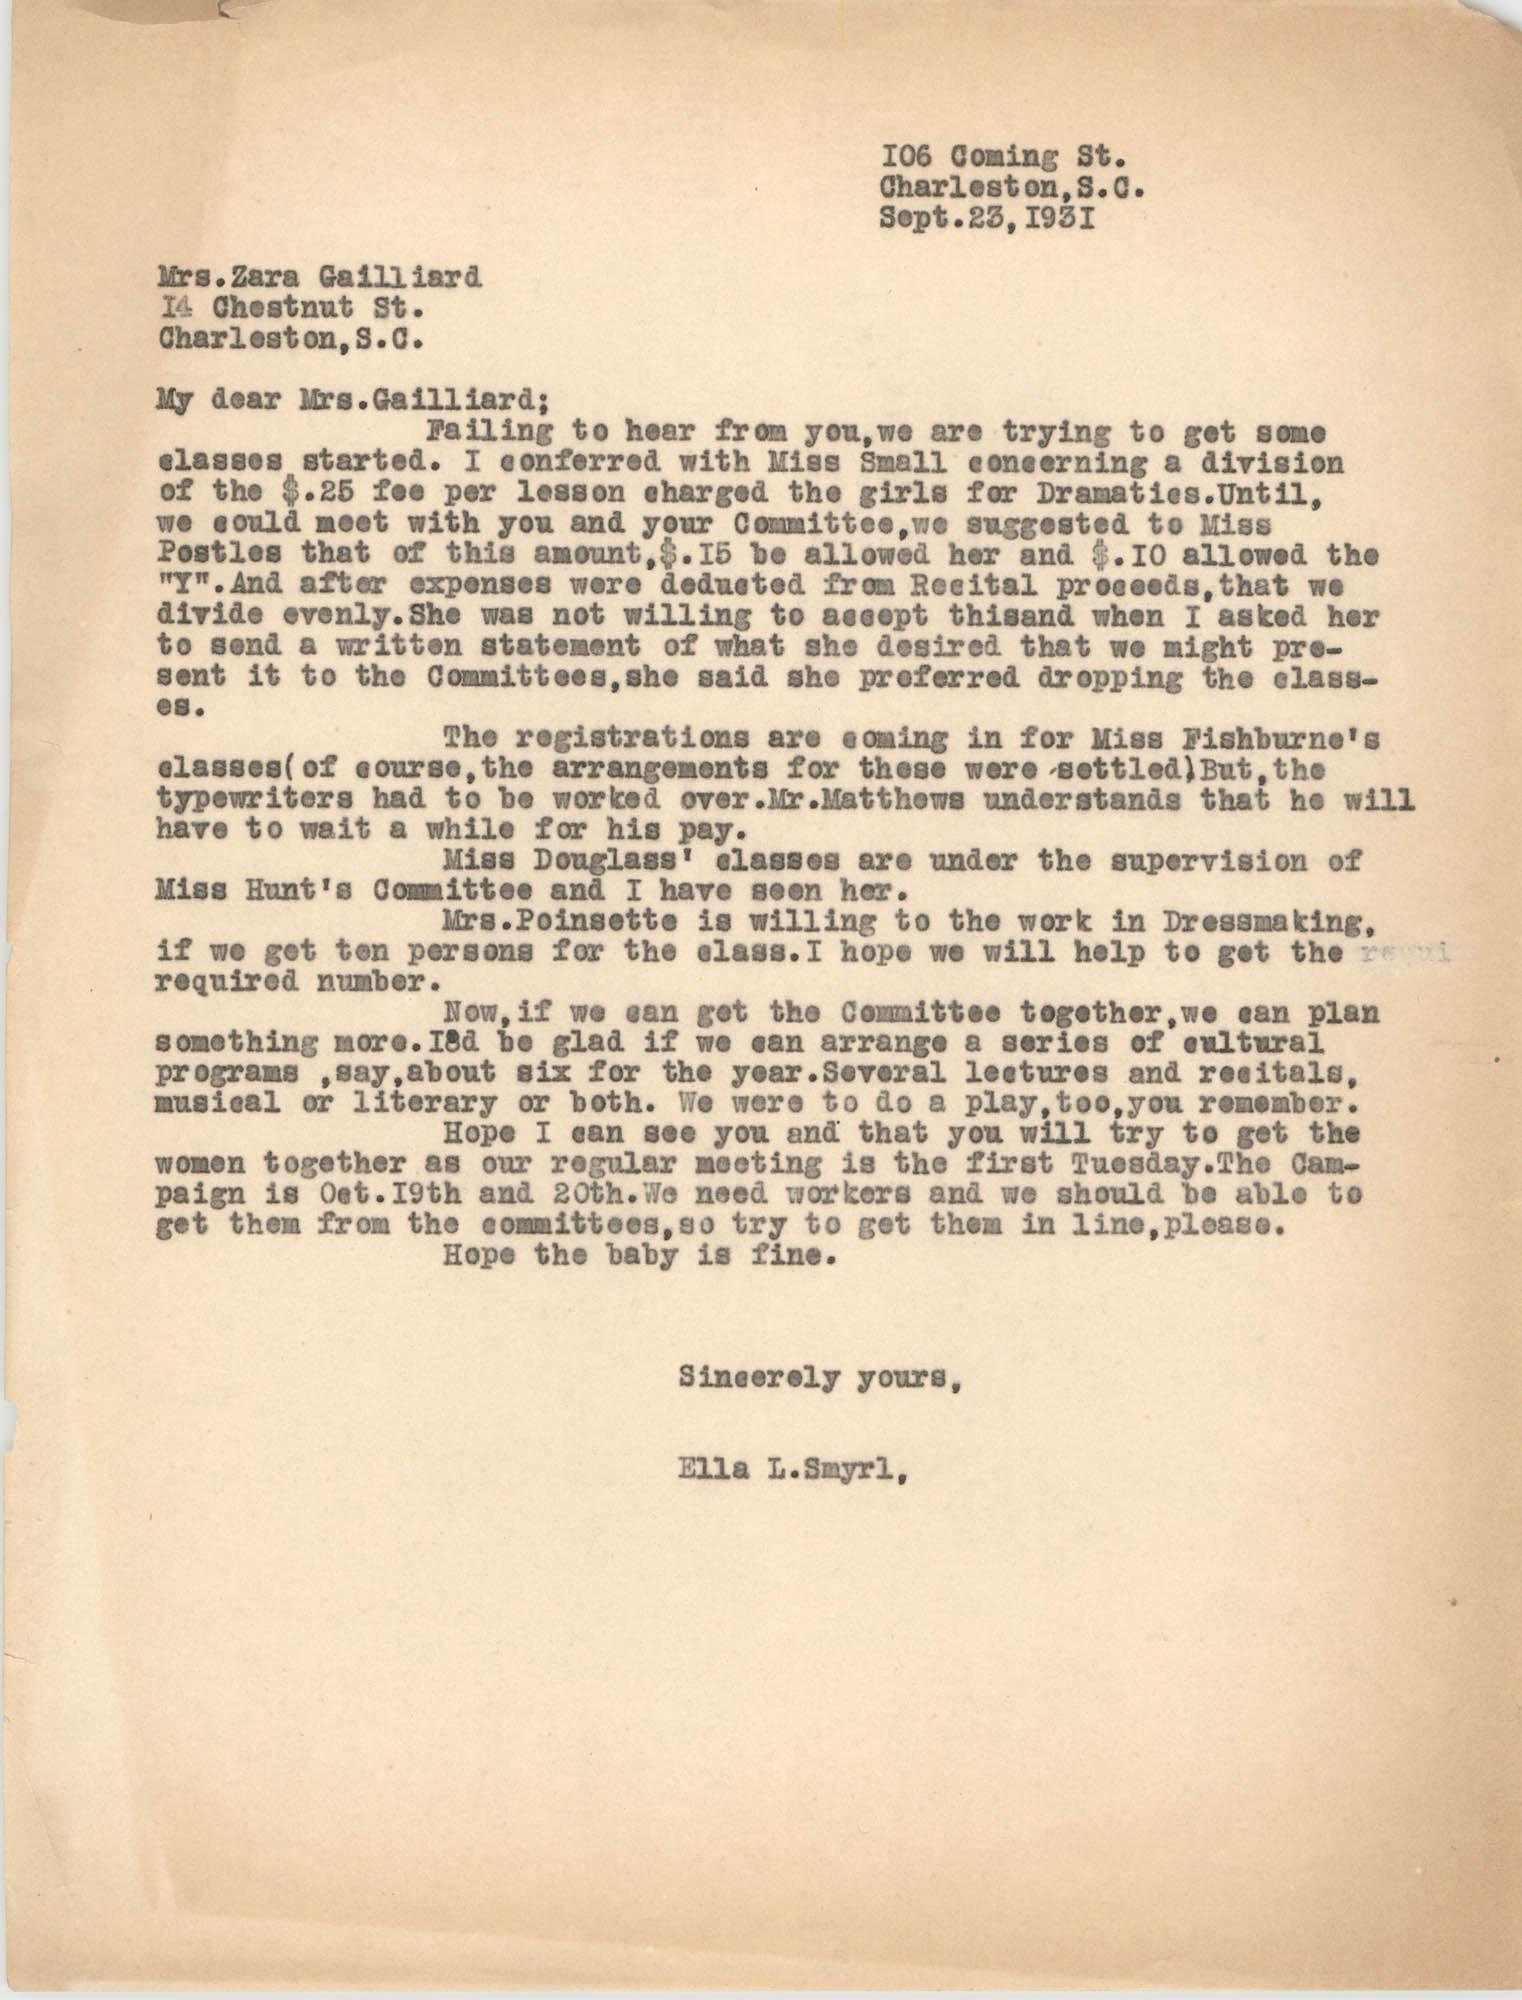 Letter from Ella L. Smyrl to Zara Gailliard, September 23, 1931